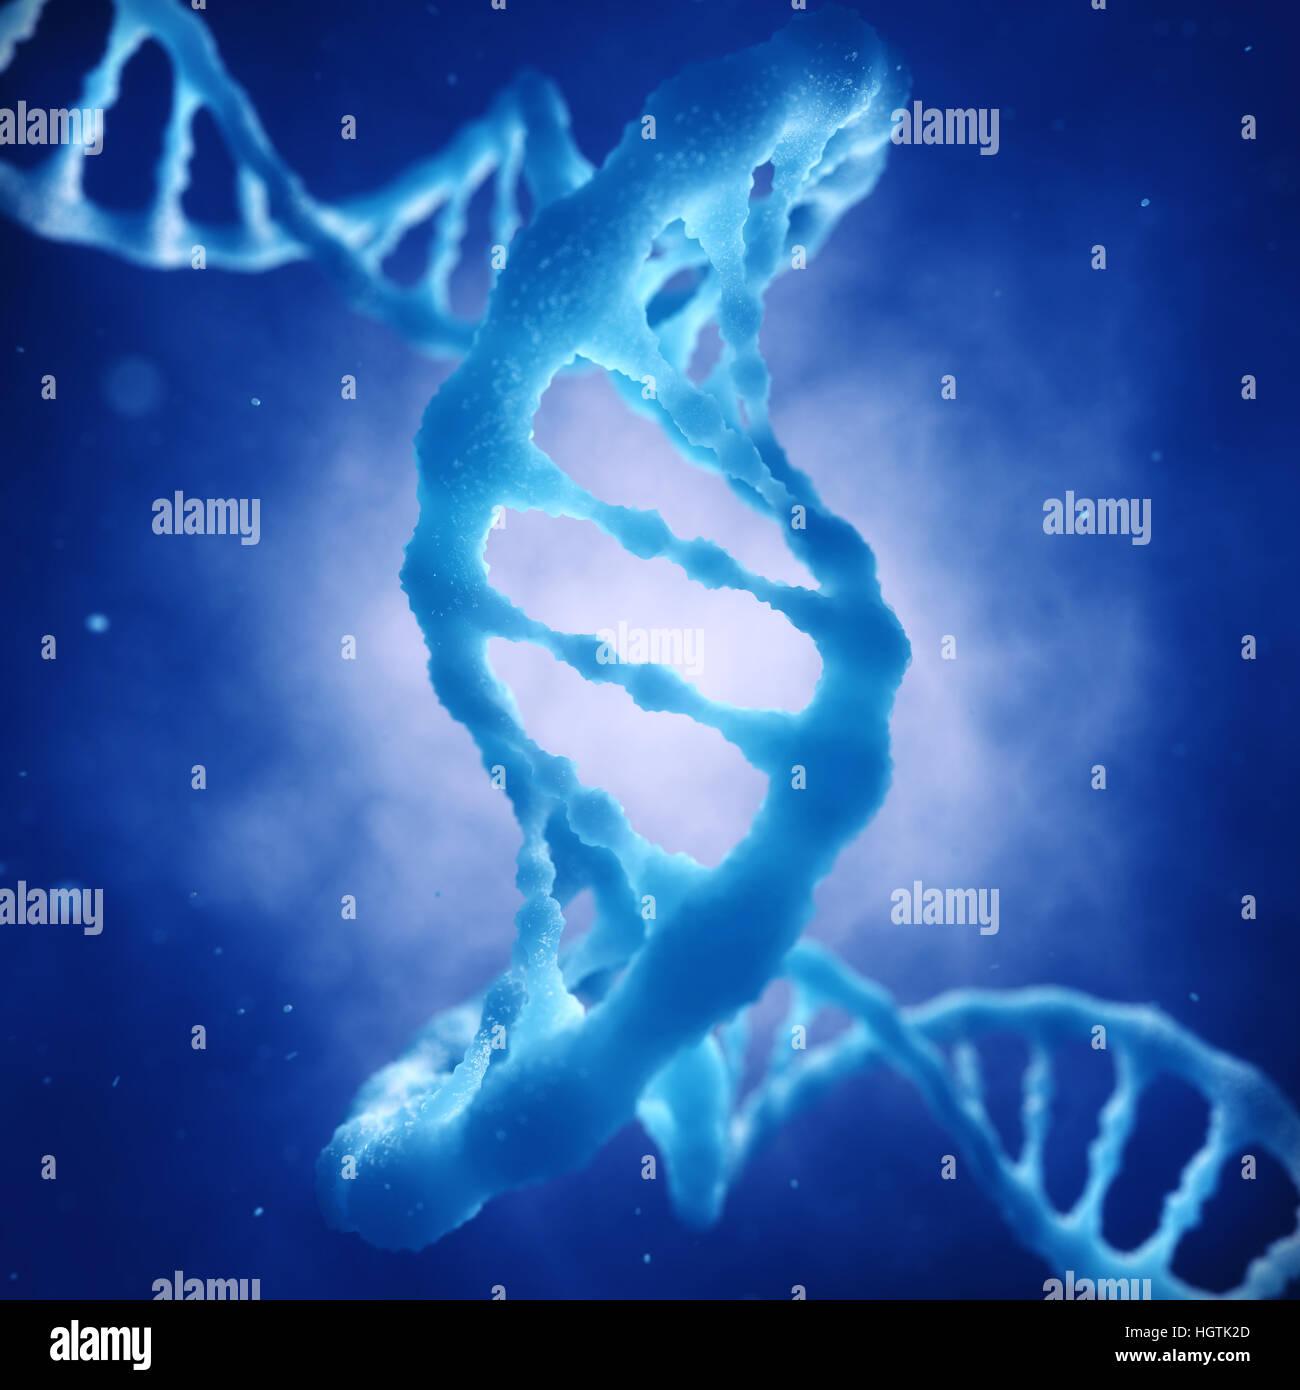 Dna double helix molecule , Gene mutation , Dna Sequencing , Genetic disorder - Stock Image